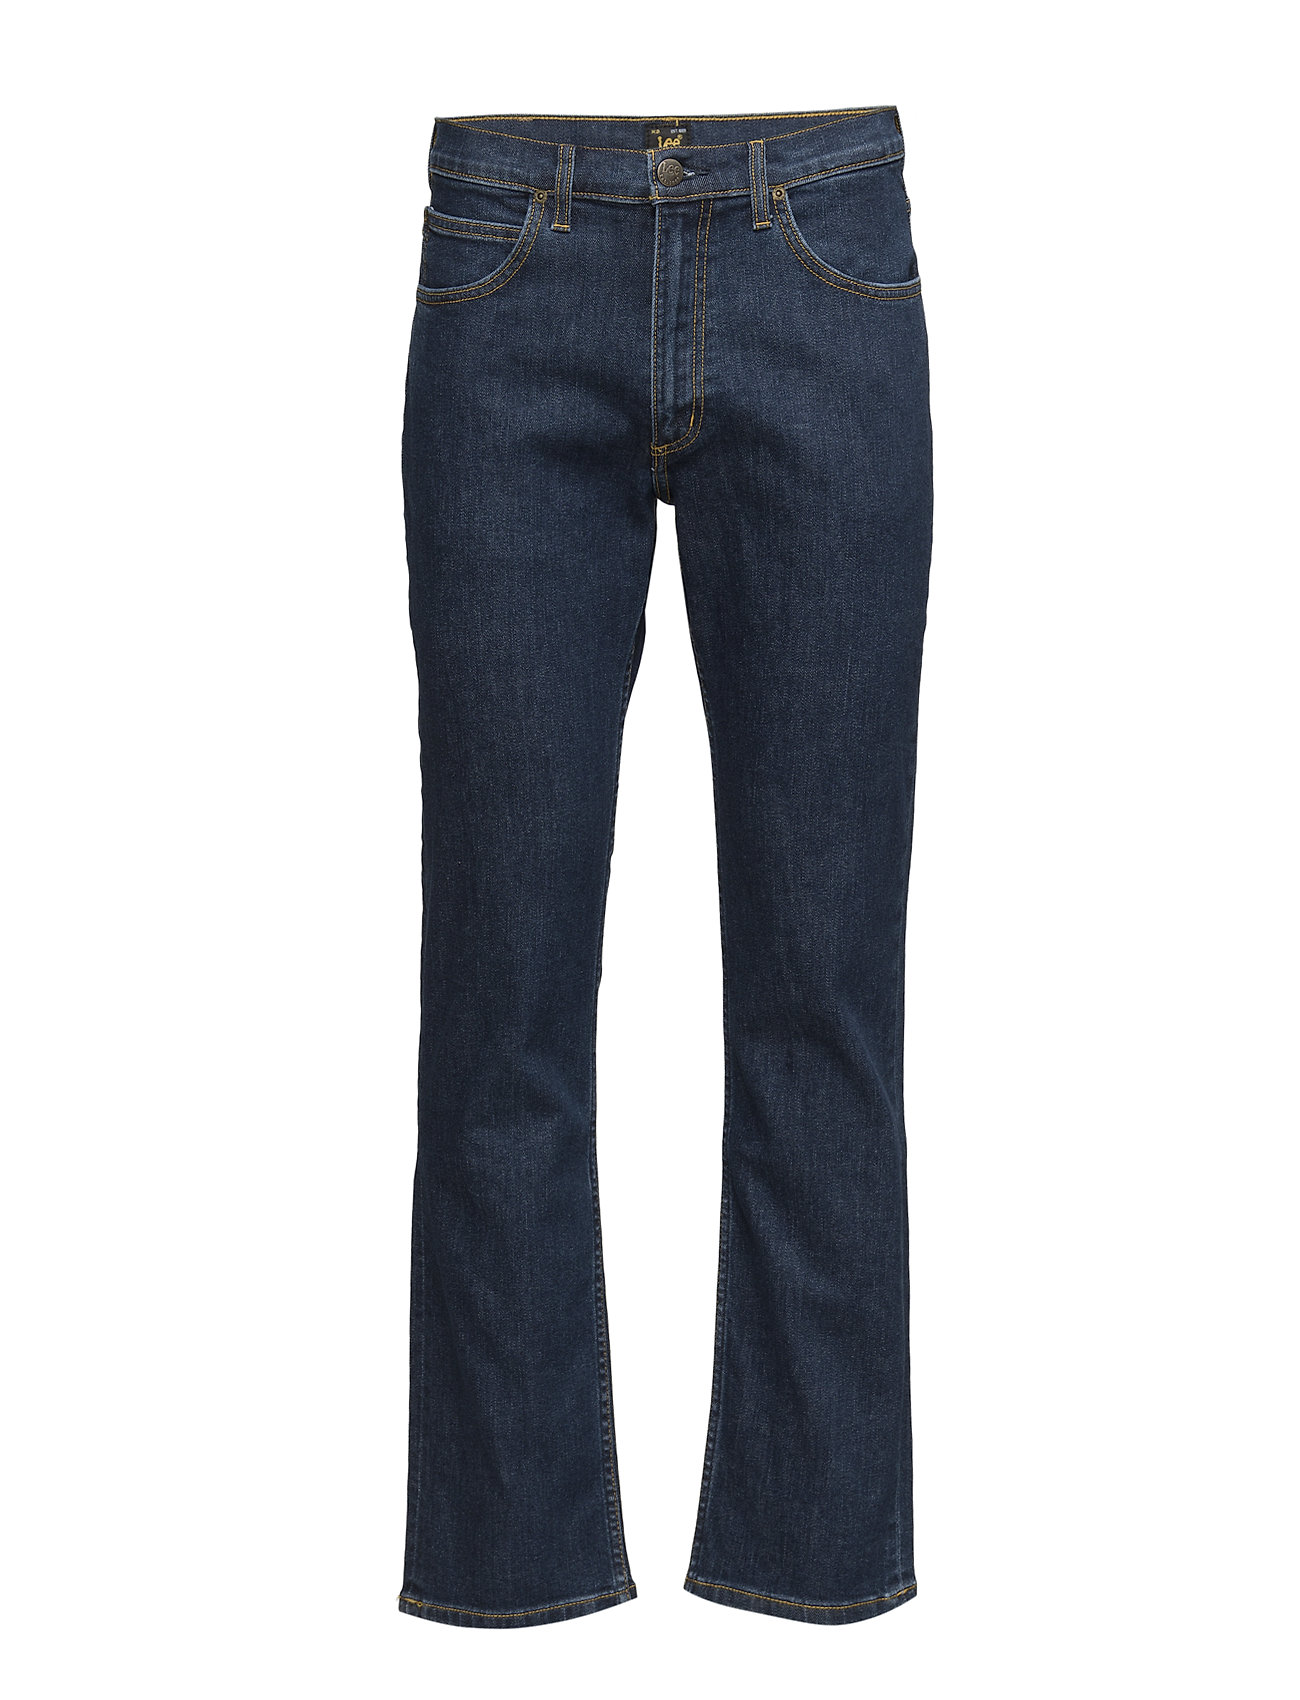 Lee Jeans BROOKLYN STRAIGHT - DARK STONEWASH